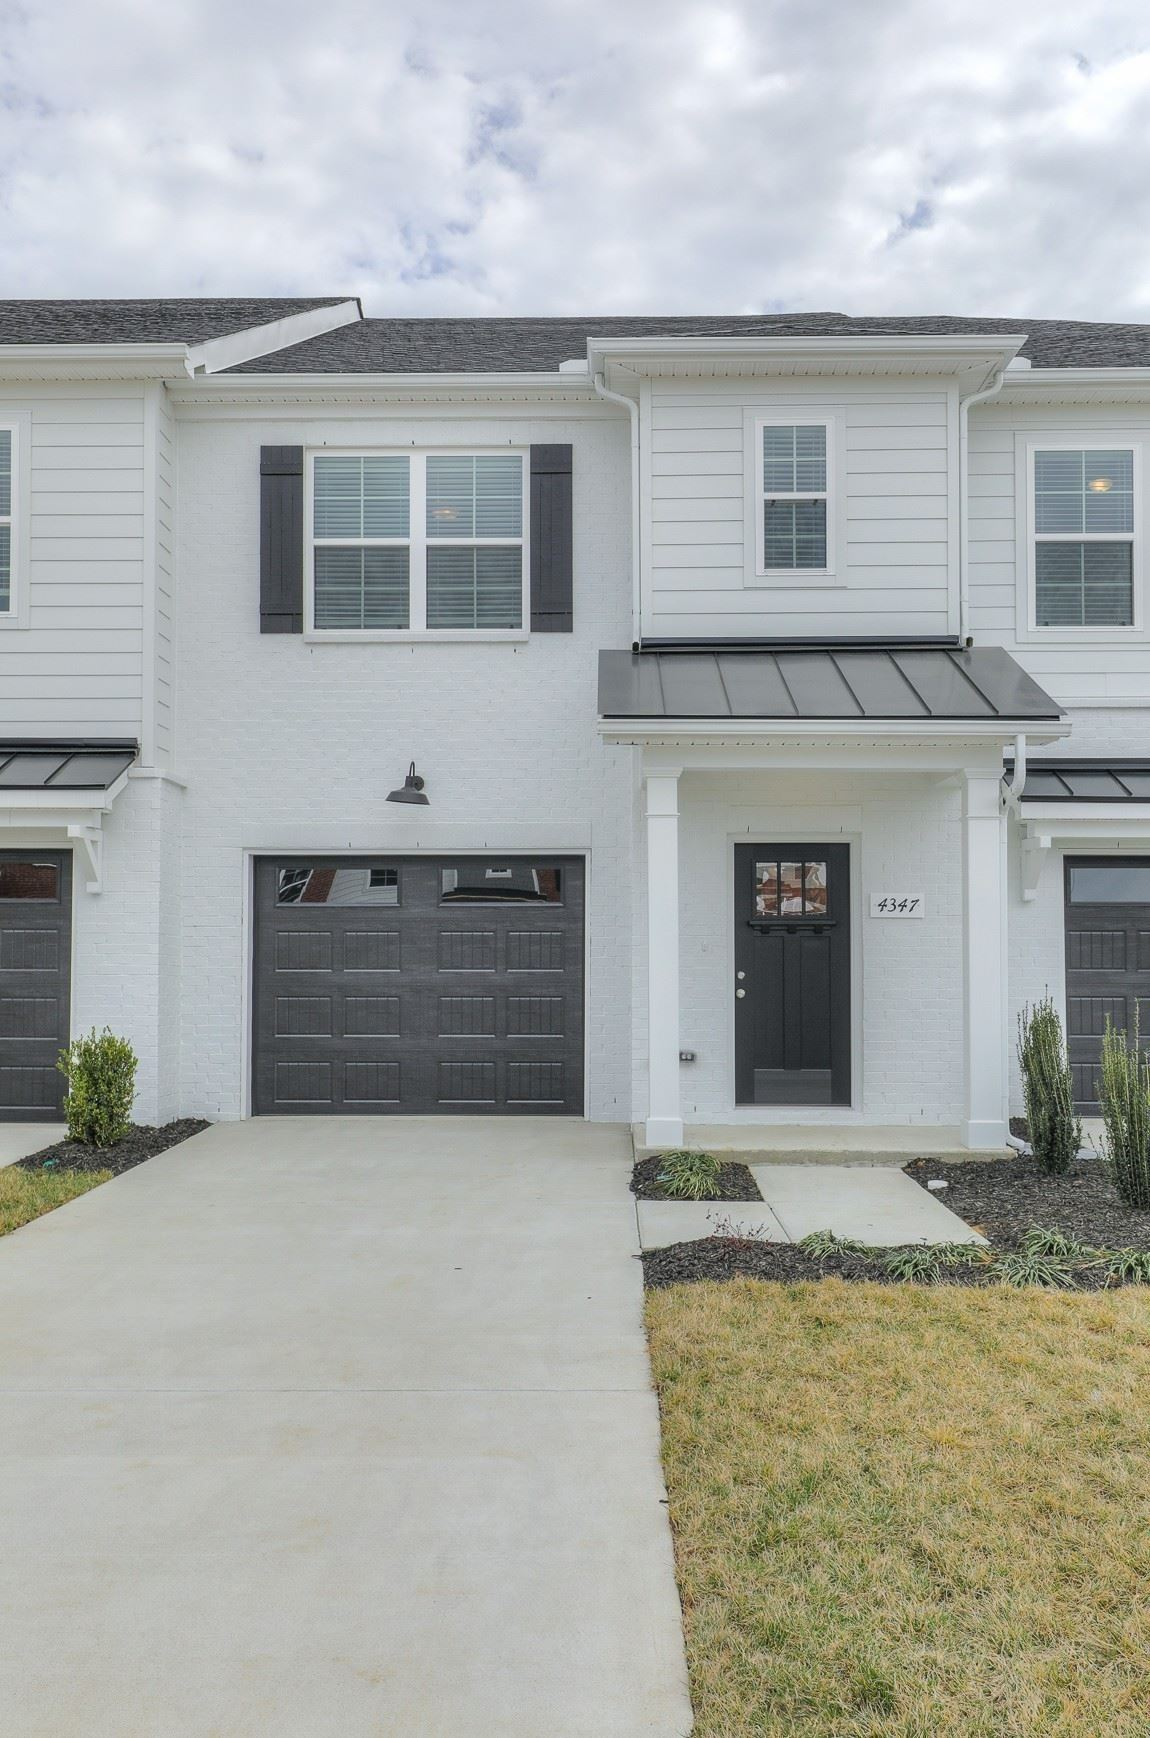 Photo of 4204 Spyglass Drive, Murfreesboro, TN 37127 (MLS # 2252094)